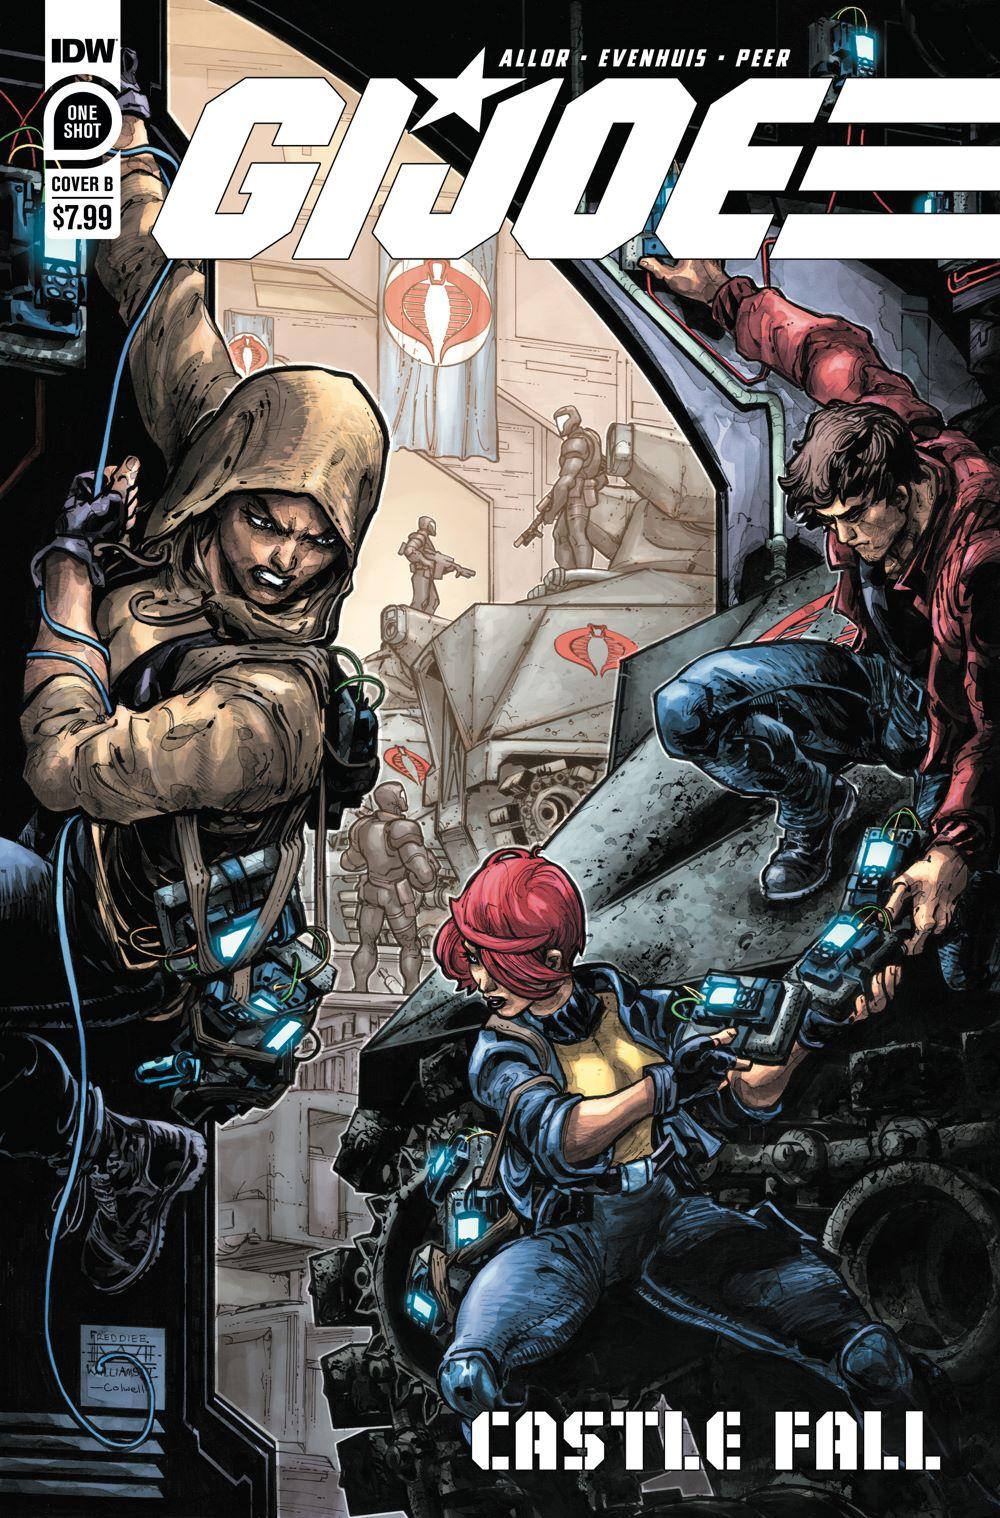 GIJoe_CastleFall01-coverB ComicList Previews: G.I. JOE CASTLE FALL #1